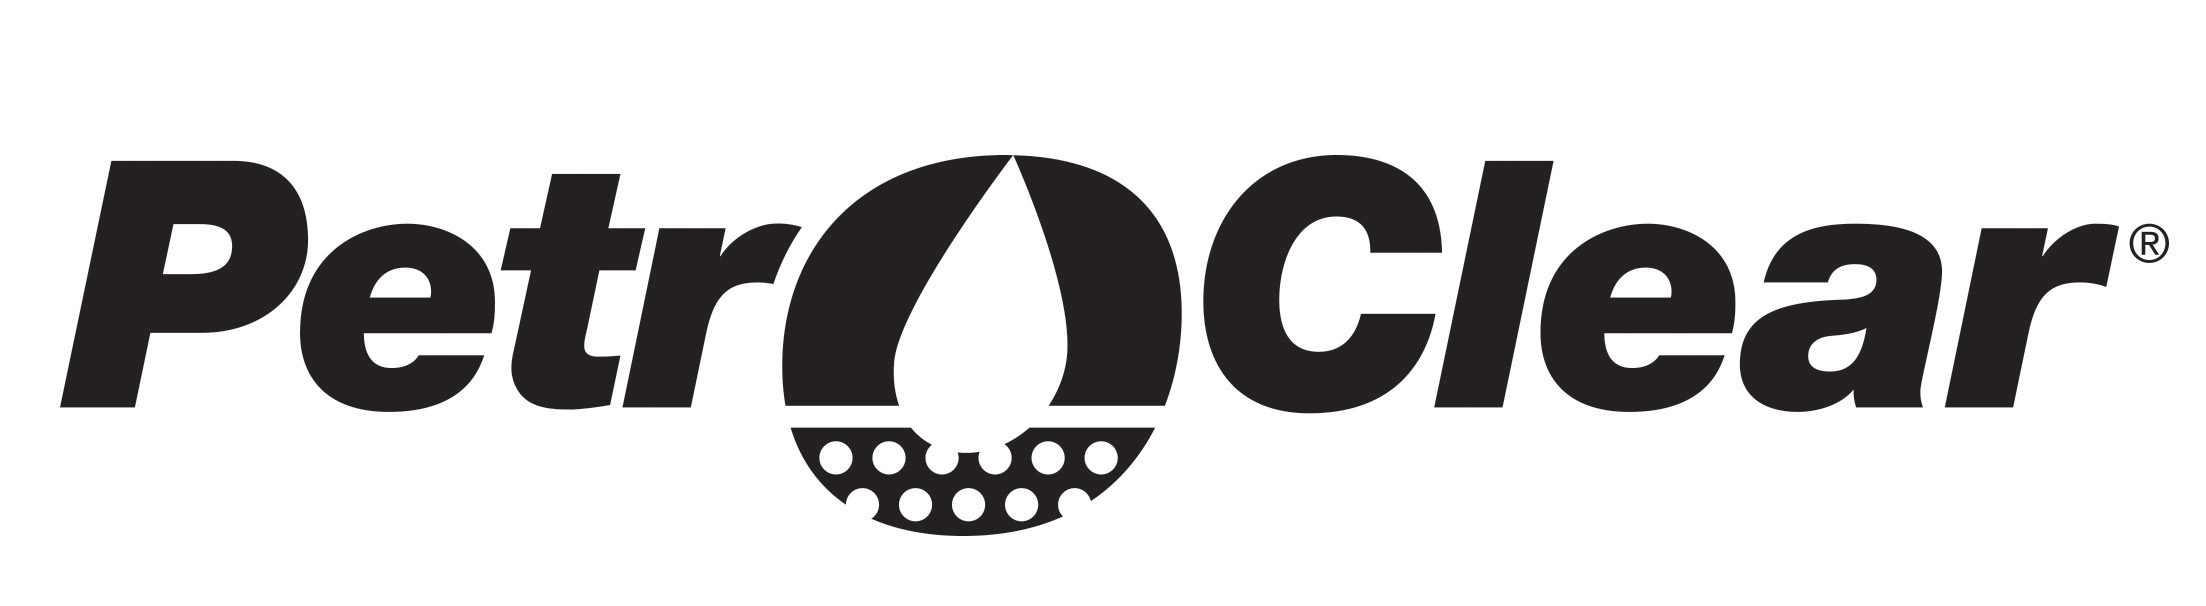 PetroClear Black Logo on White